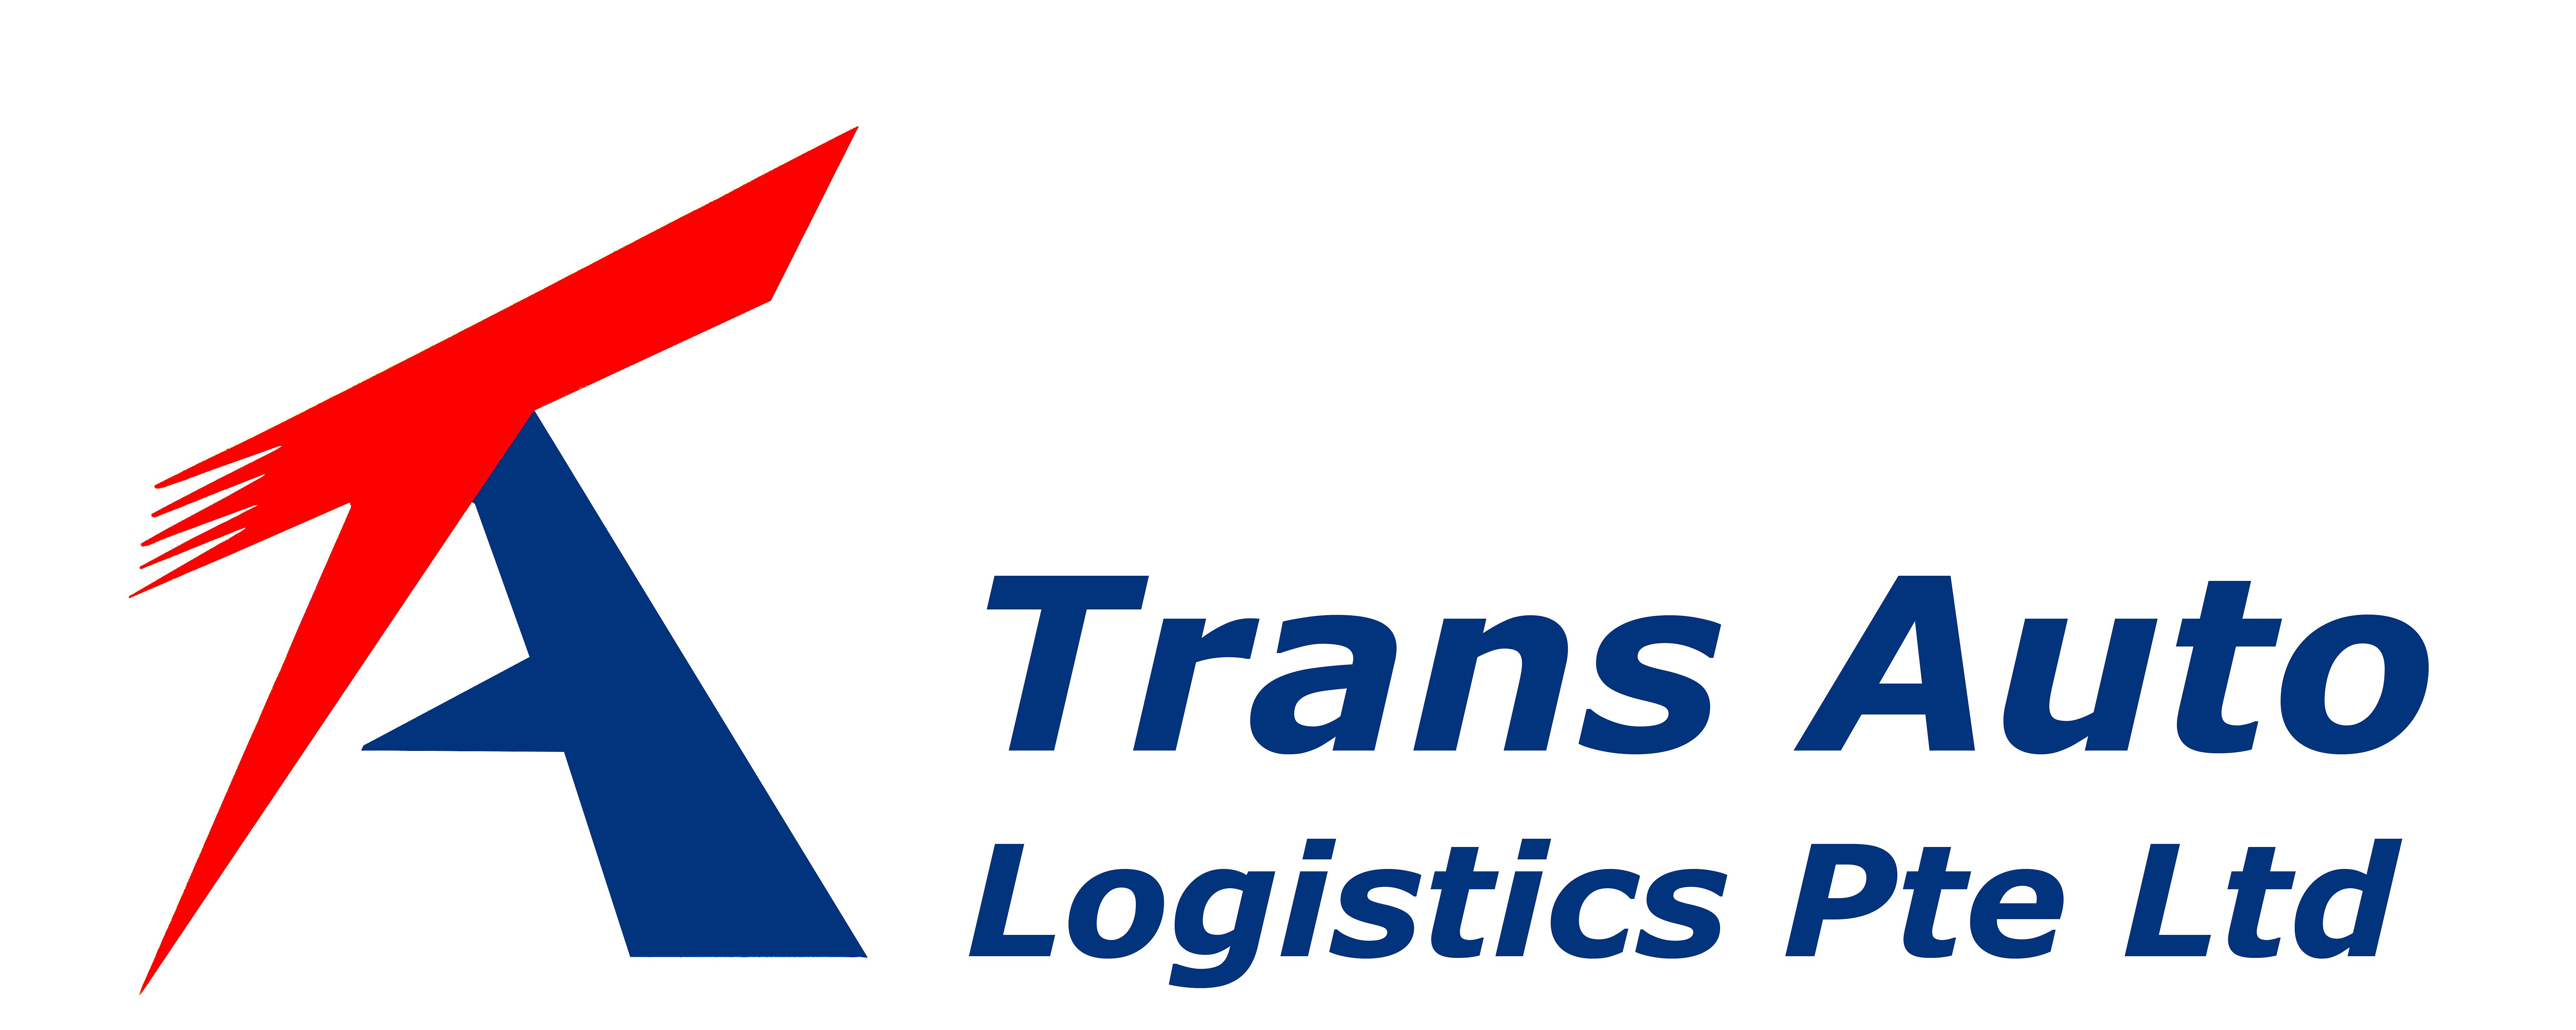 Trans Auto Logistics Pte Ltd